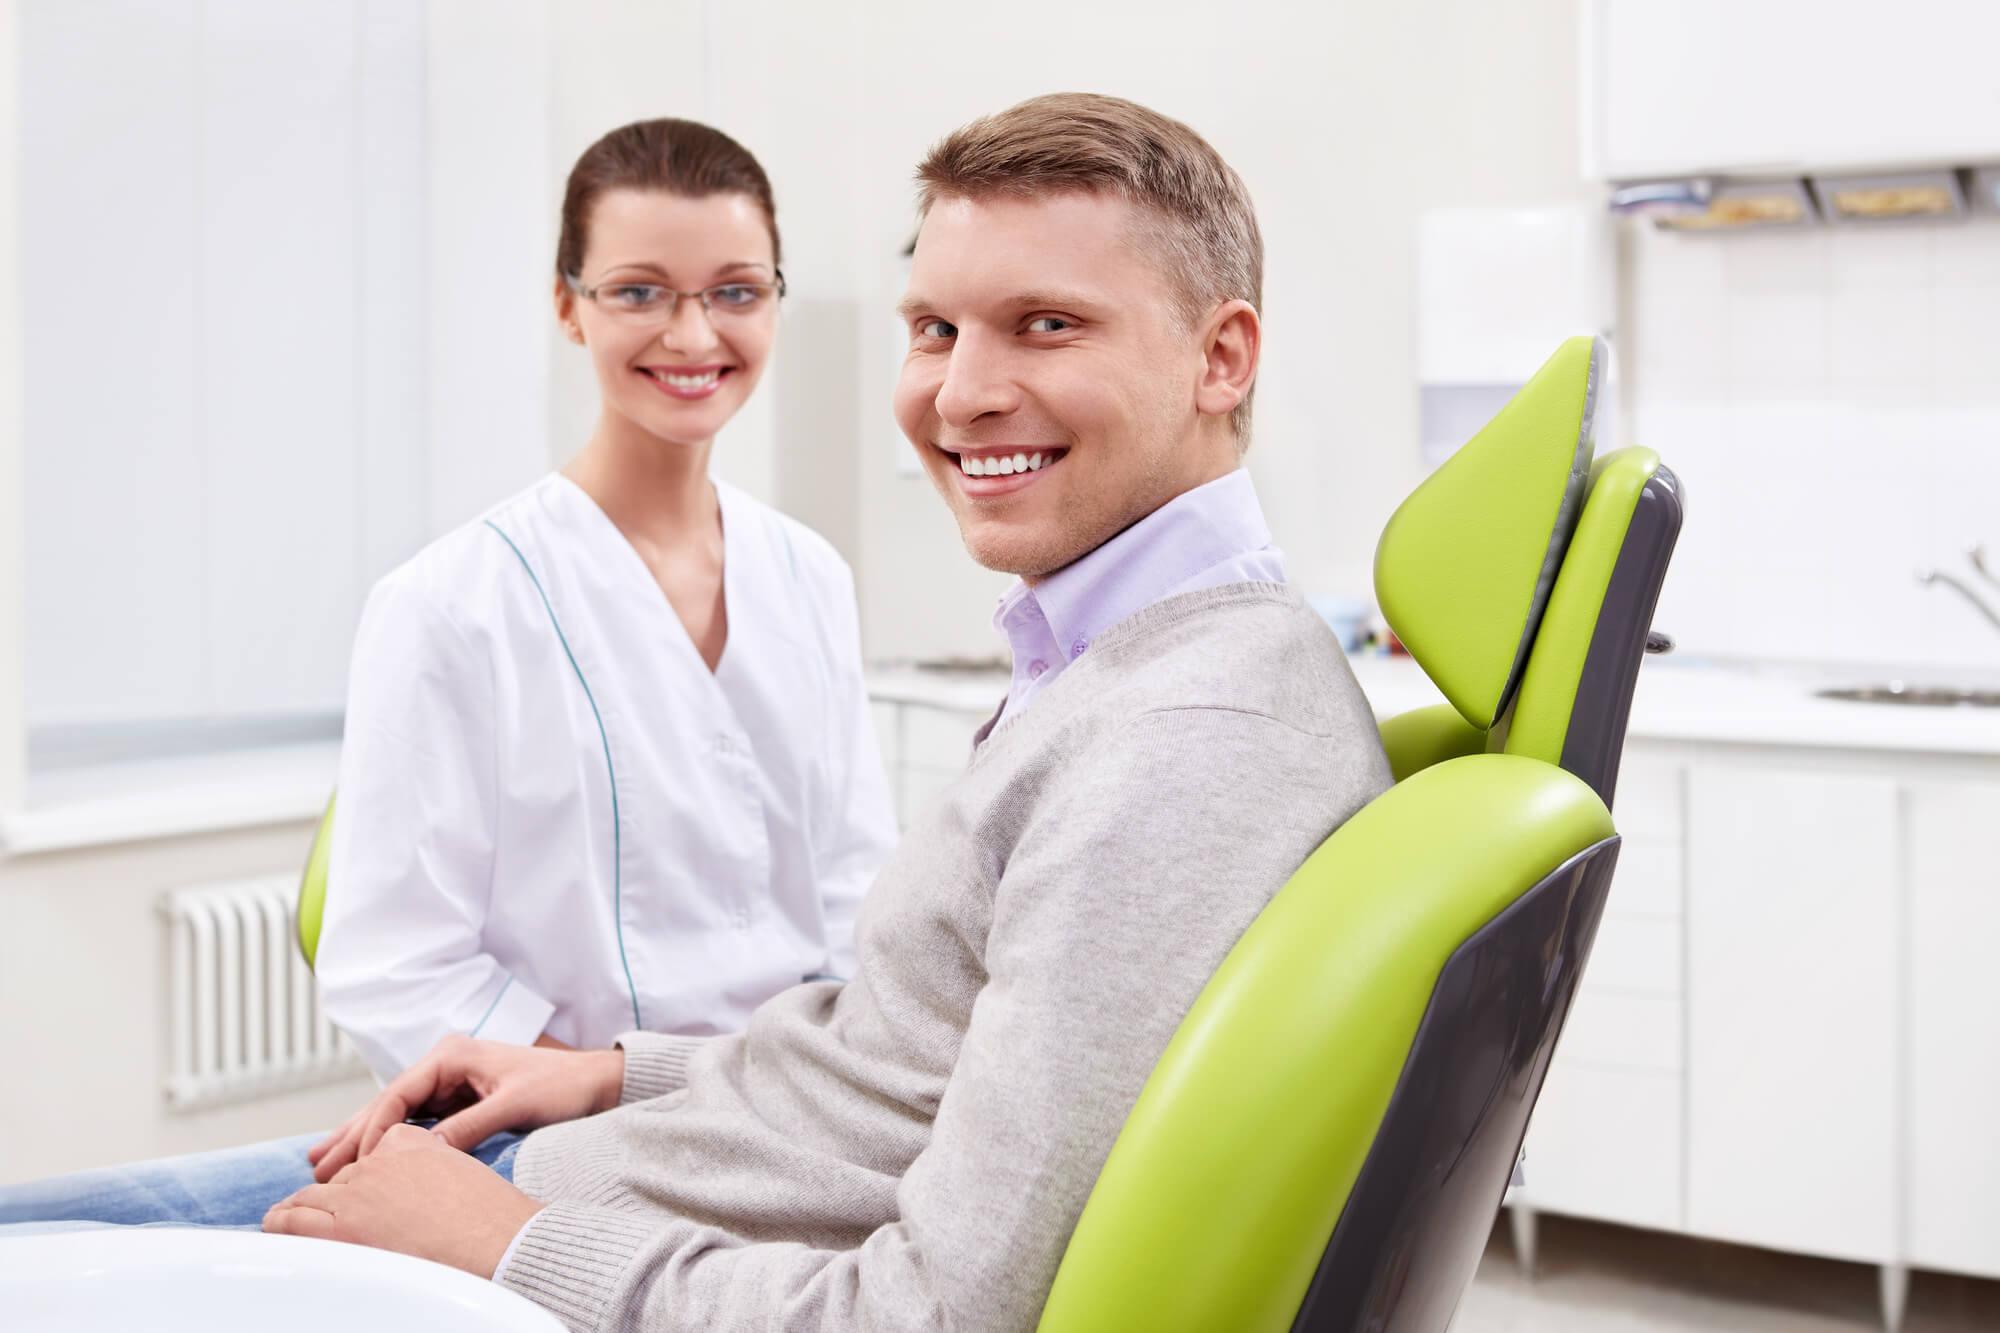 richmond endodontics visit